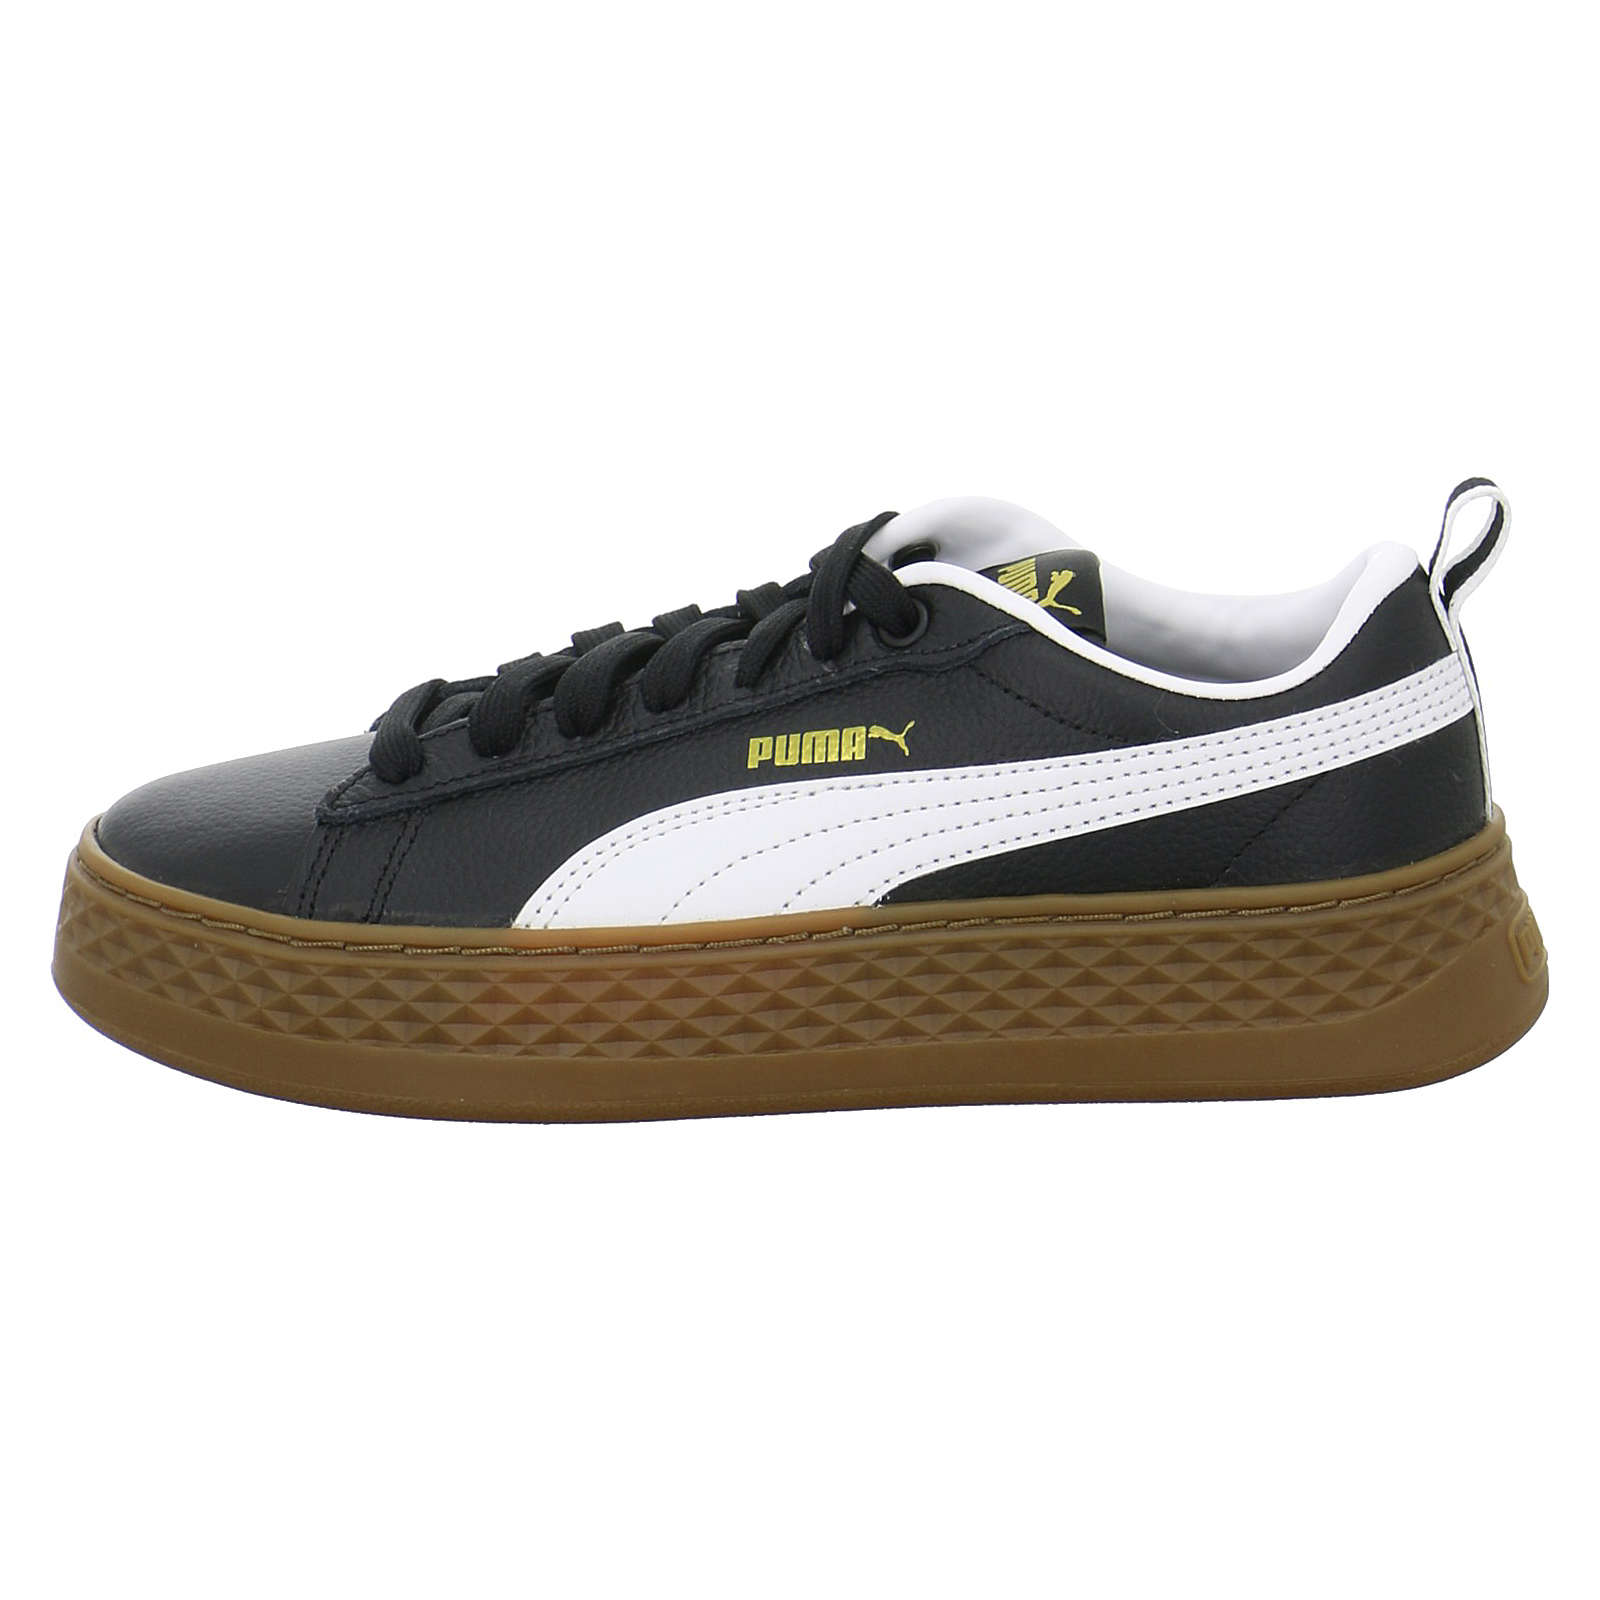 PUMA SMASH PLATFORM VT Sneakers Low schwarz Damen Gr. 37,5